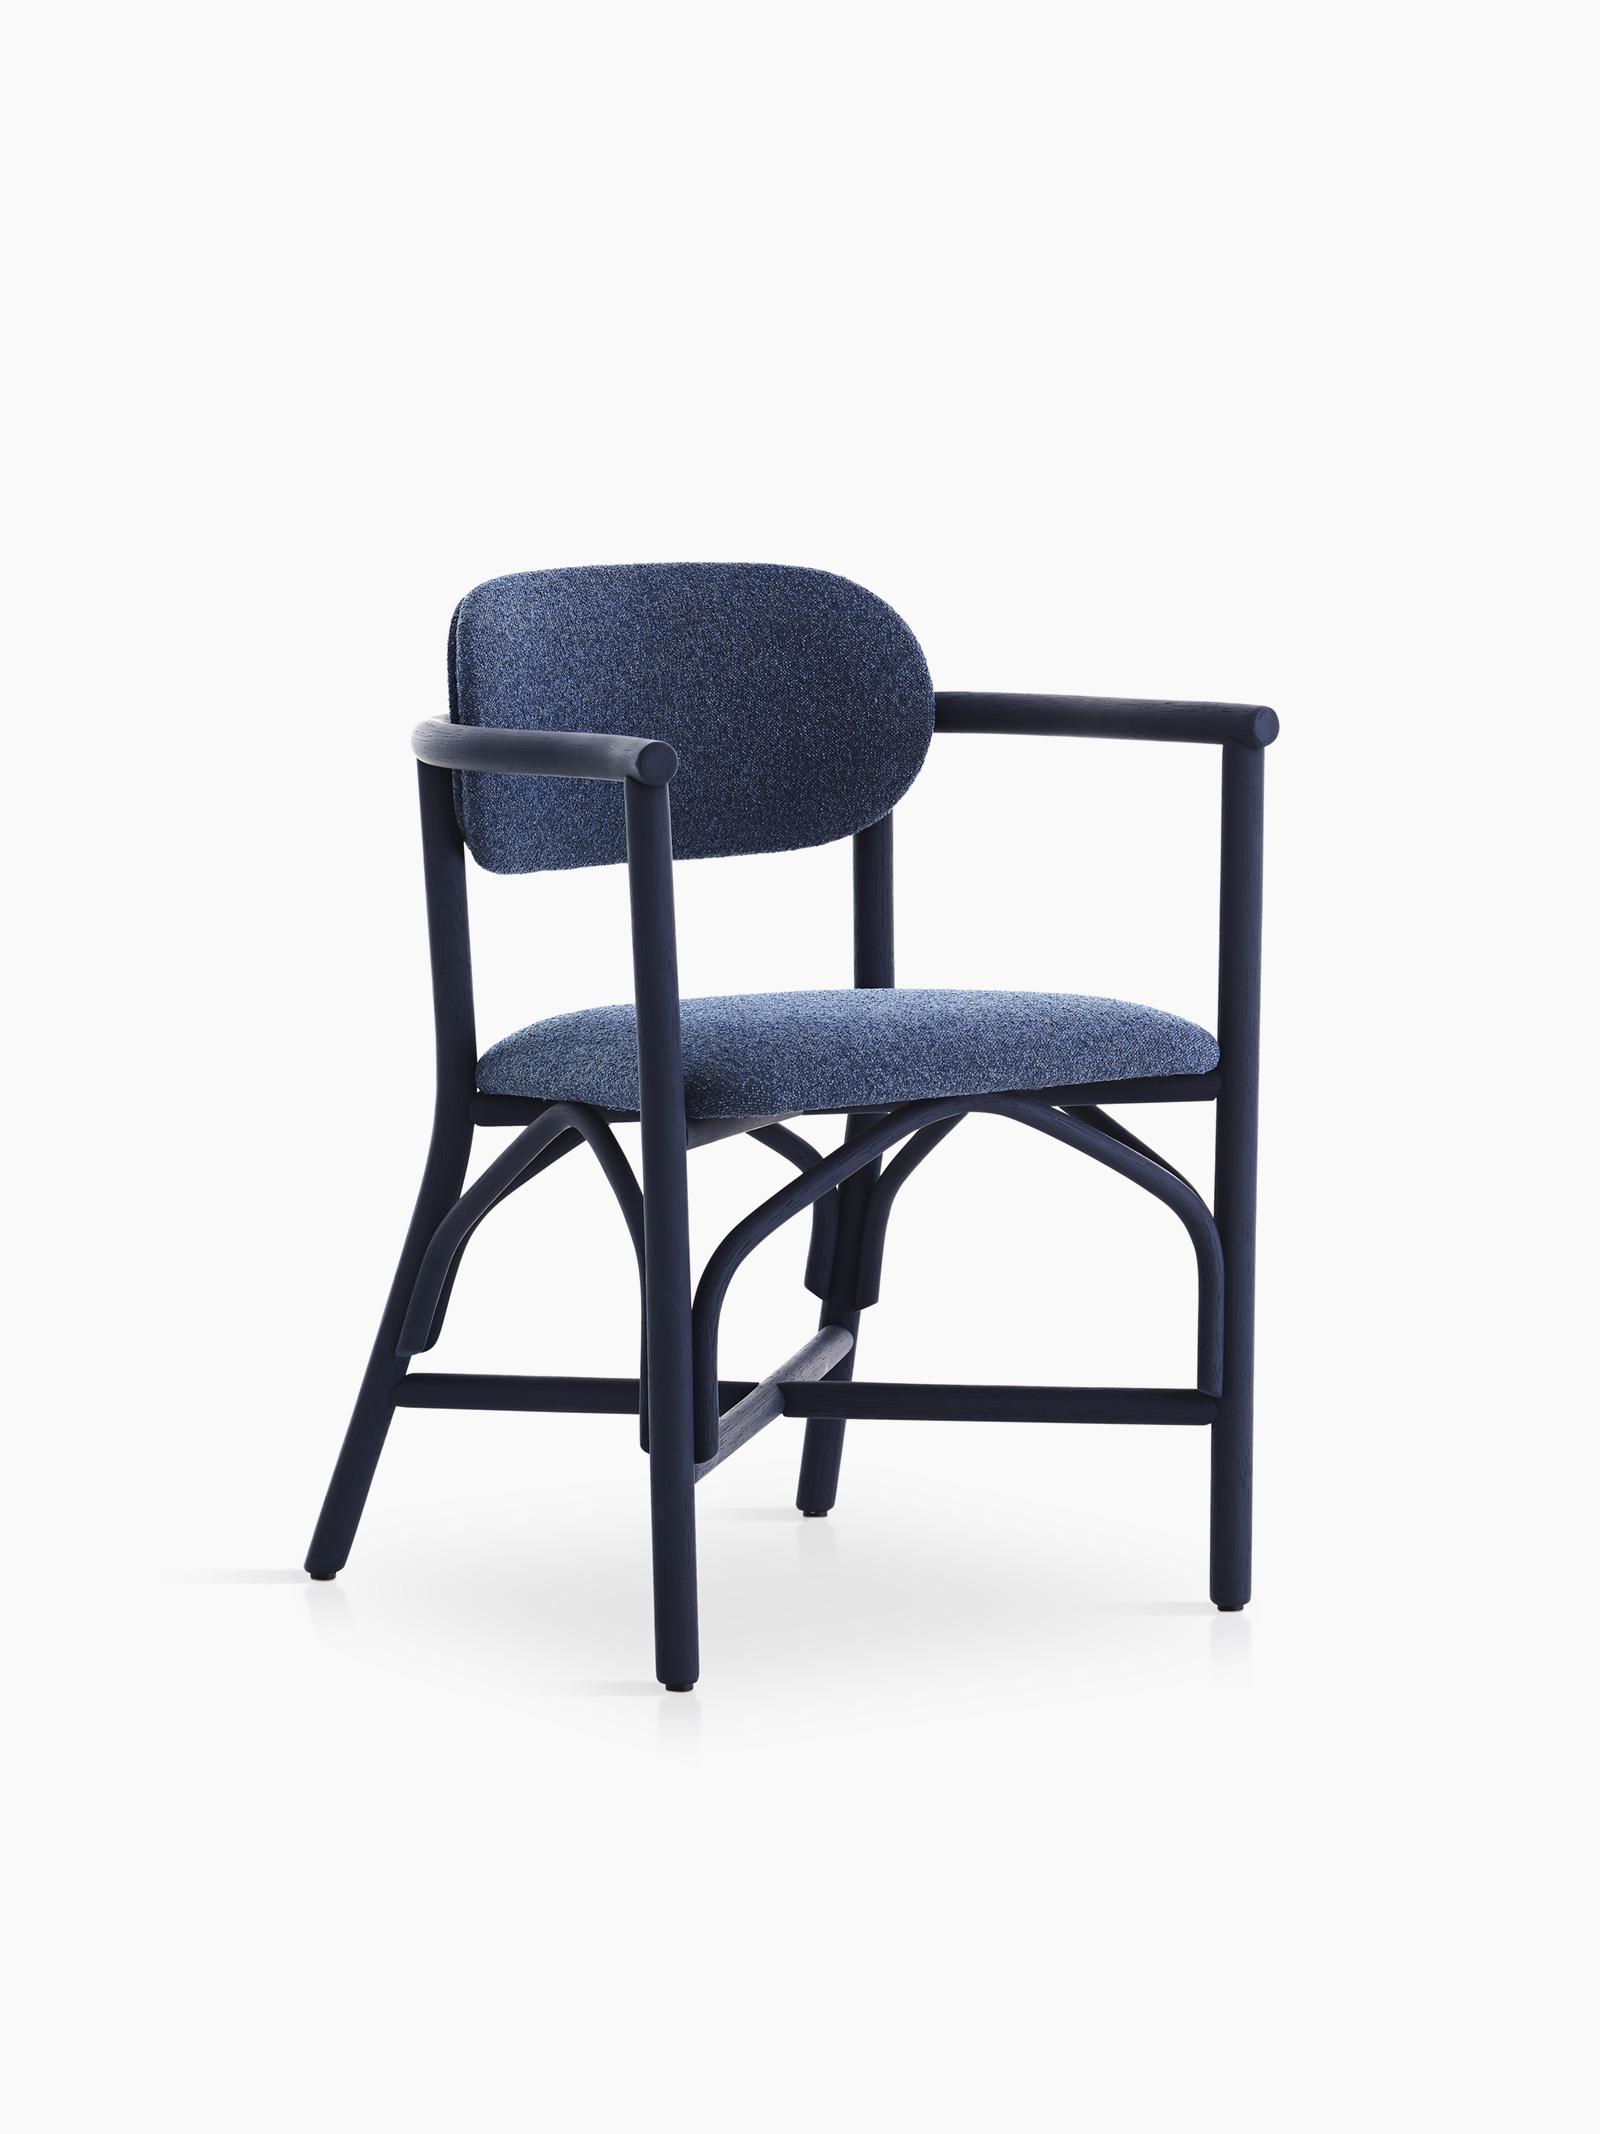 TinnappleMetz-Expormim-Altet-Upholstered-Dining-Armchair-01